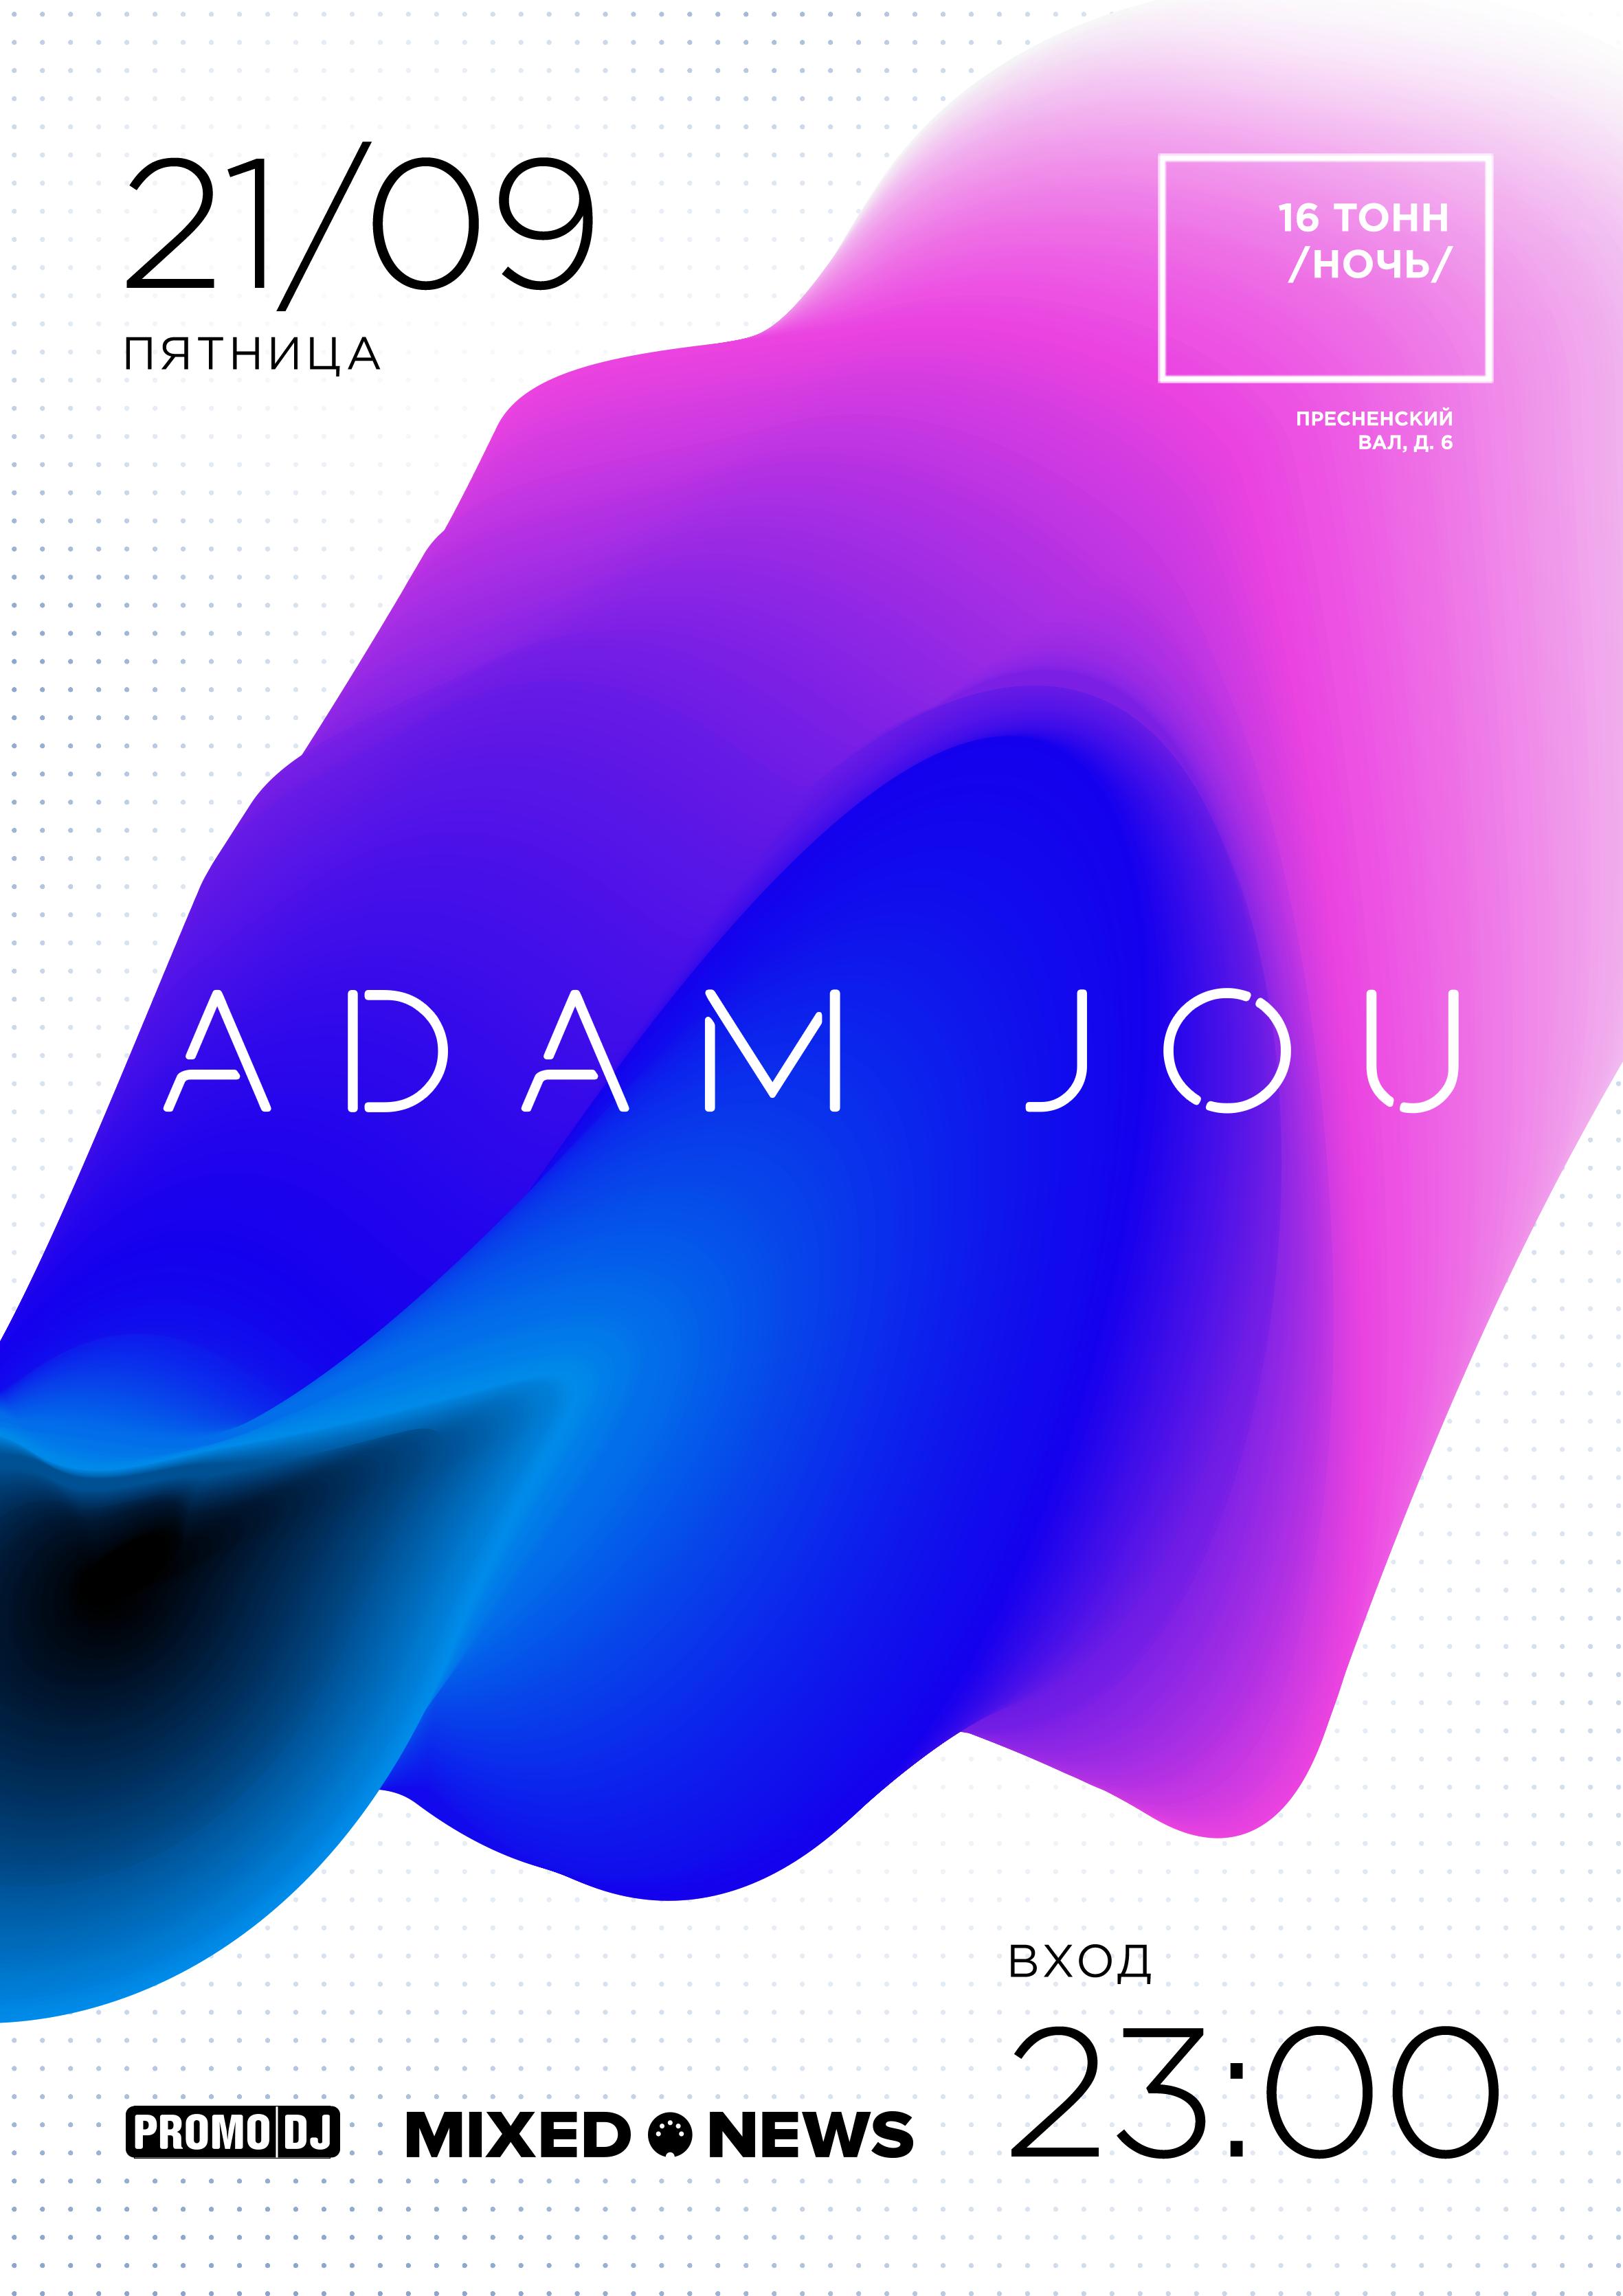 Афиша Adam Jou